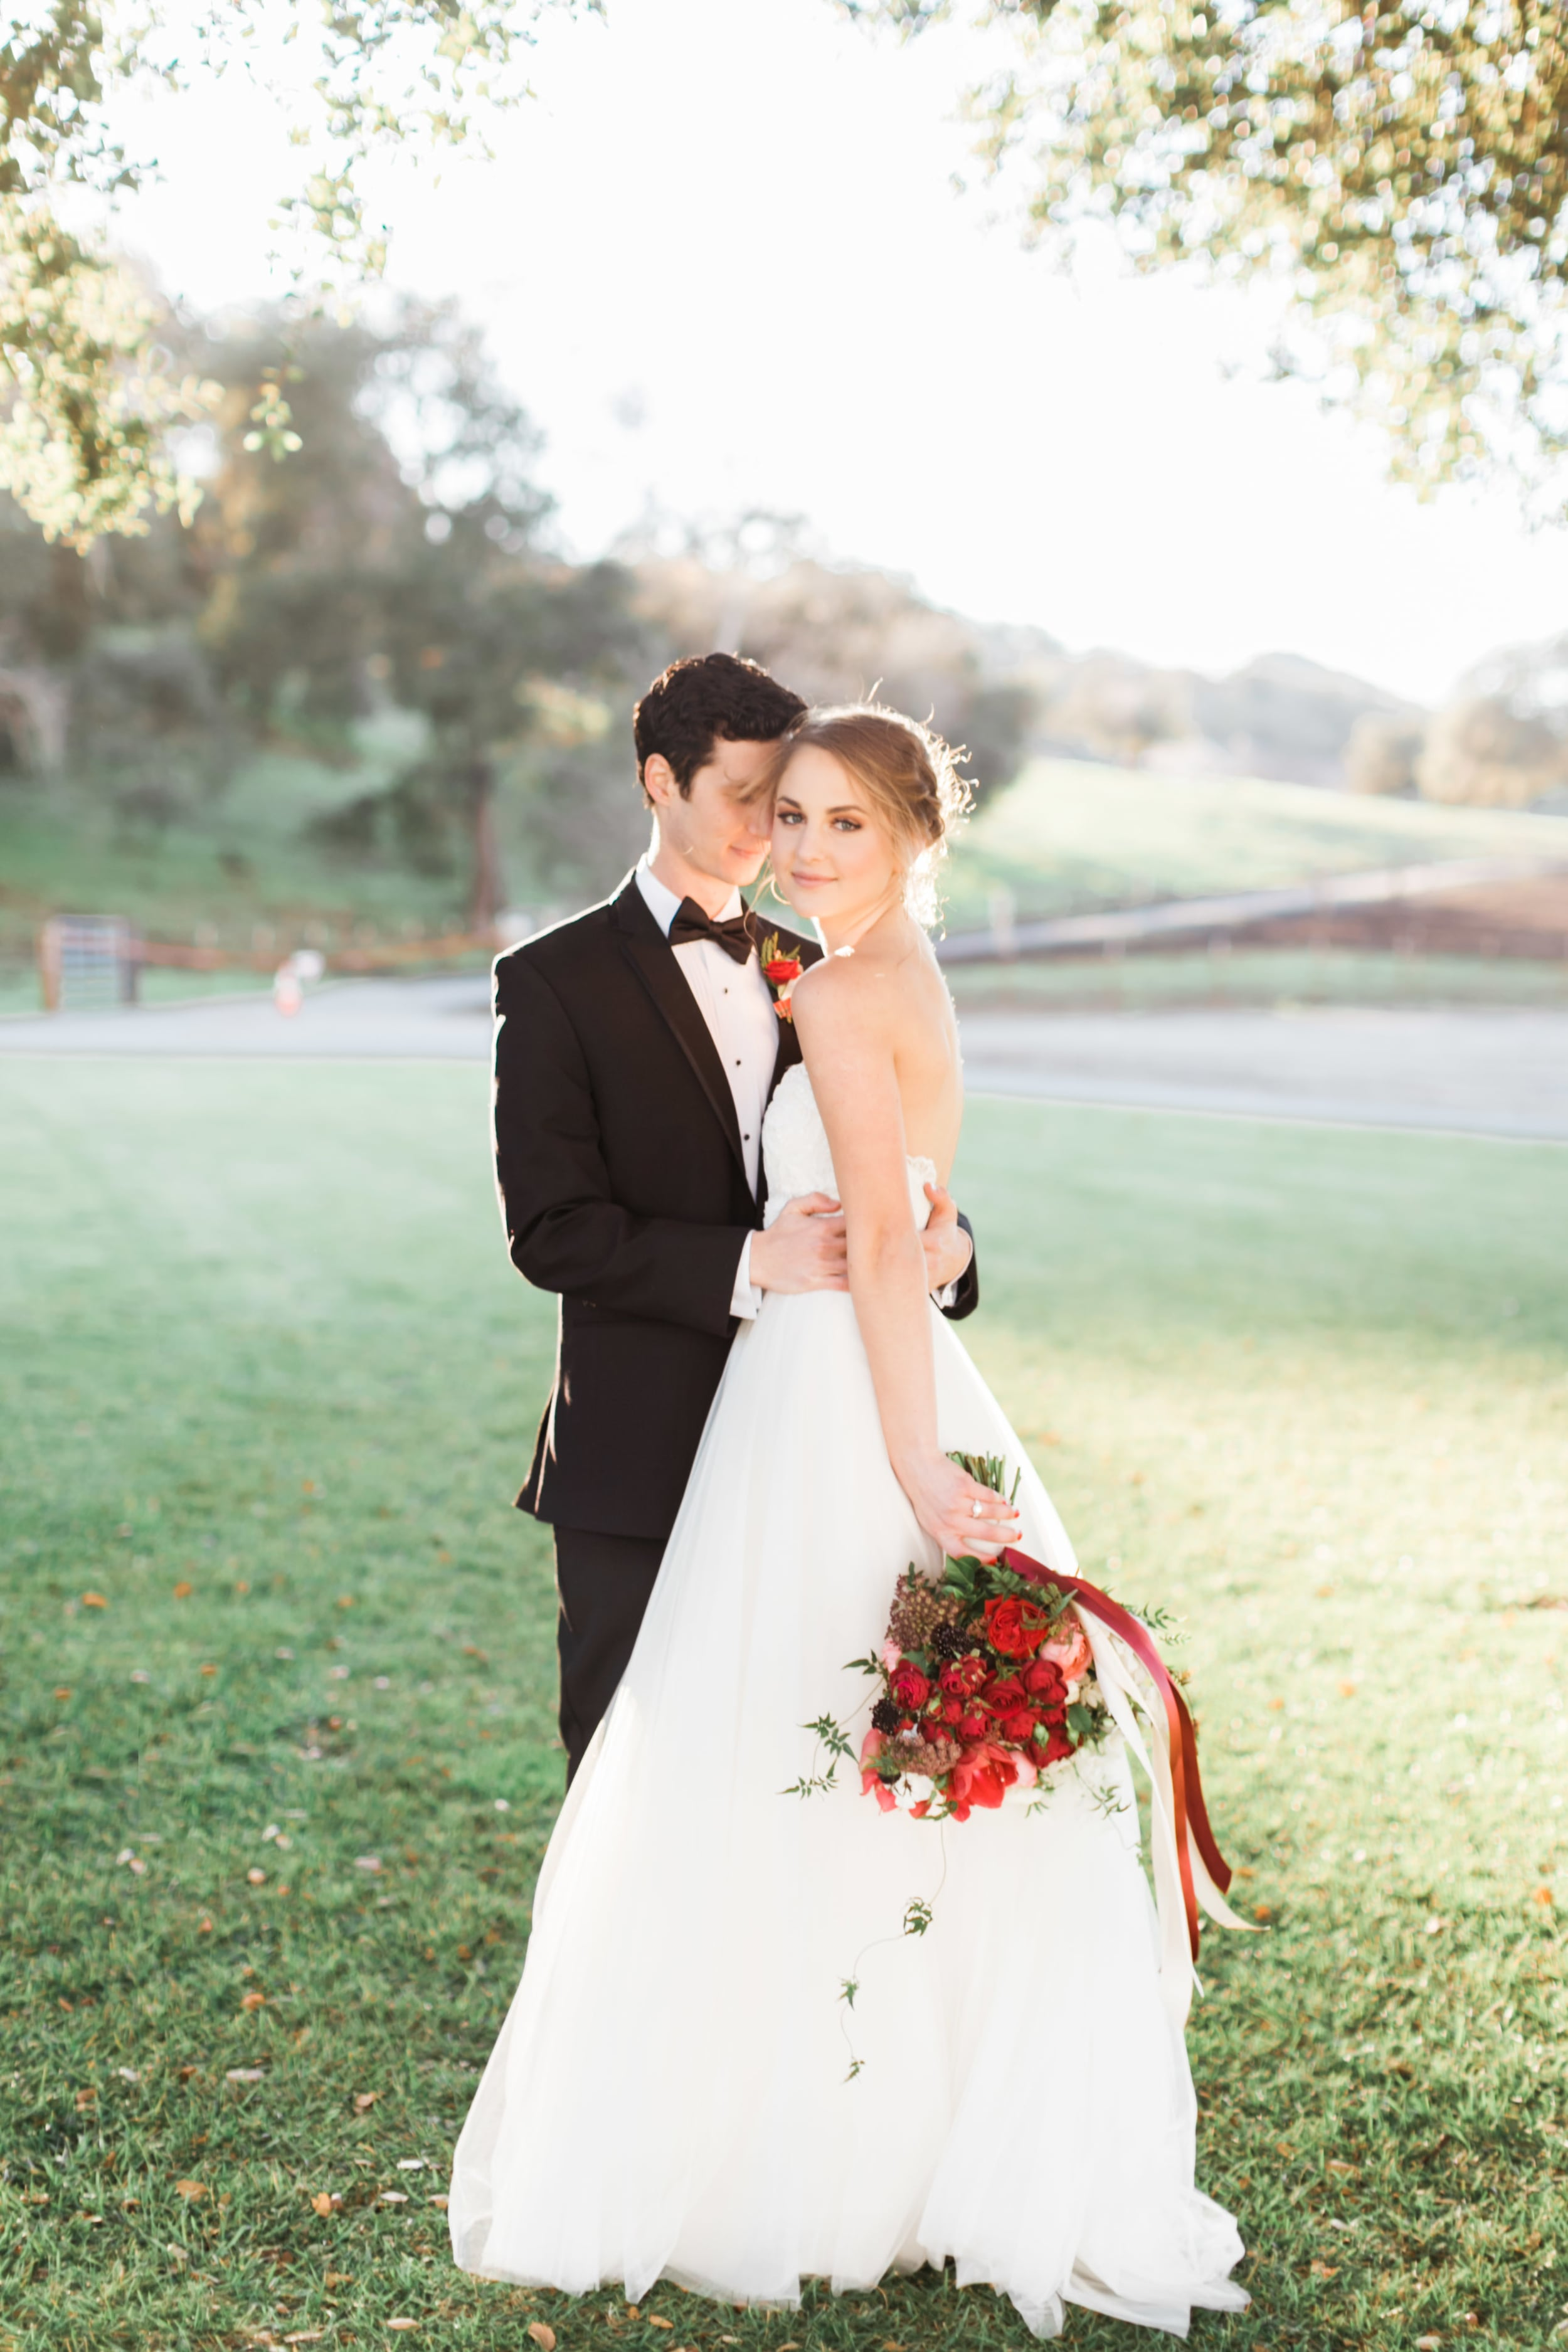 Natalie_Schutt_Photography_Winter_Wedding_San_Luis_Obispo-171.jpg